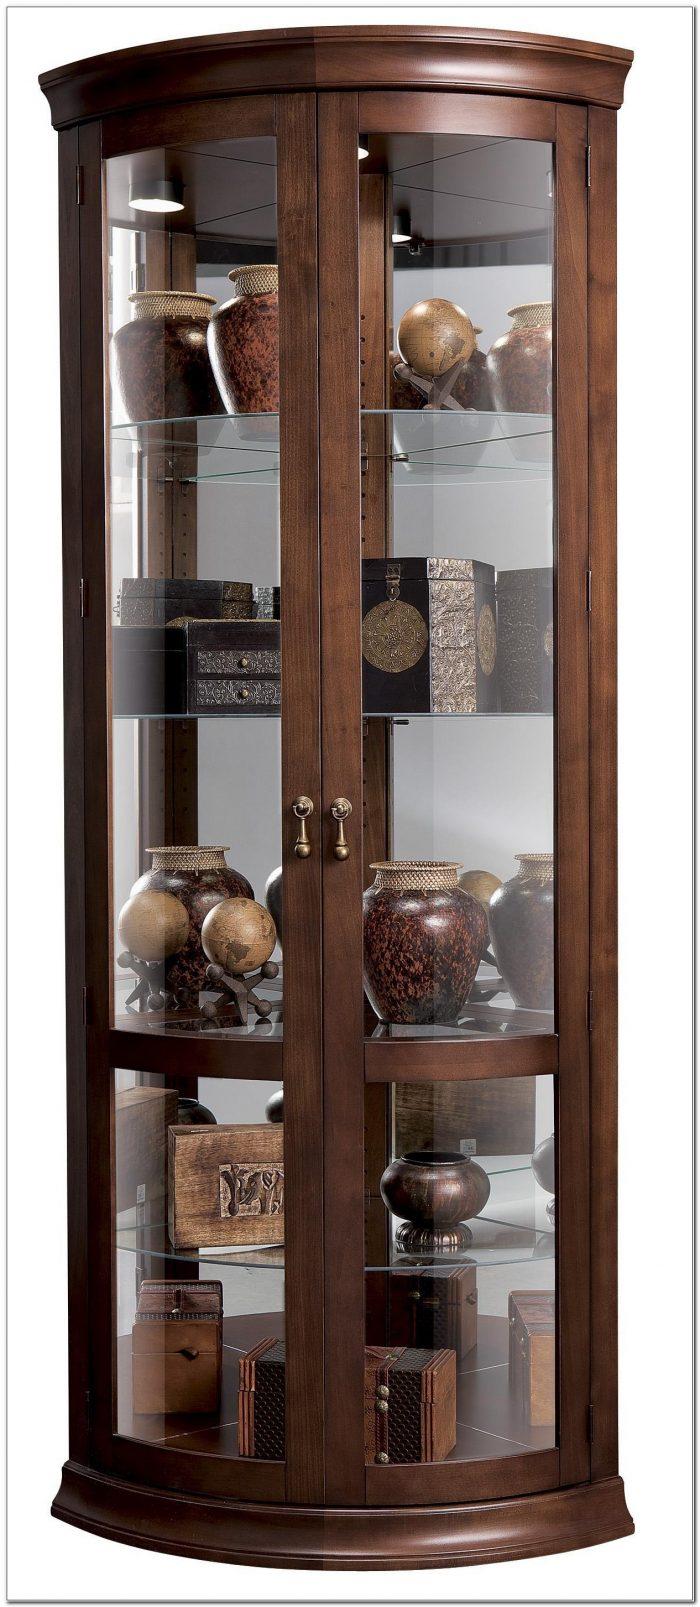 Klingsbo Light Corner Glass Curio Display Cabinet